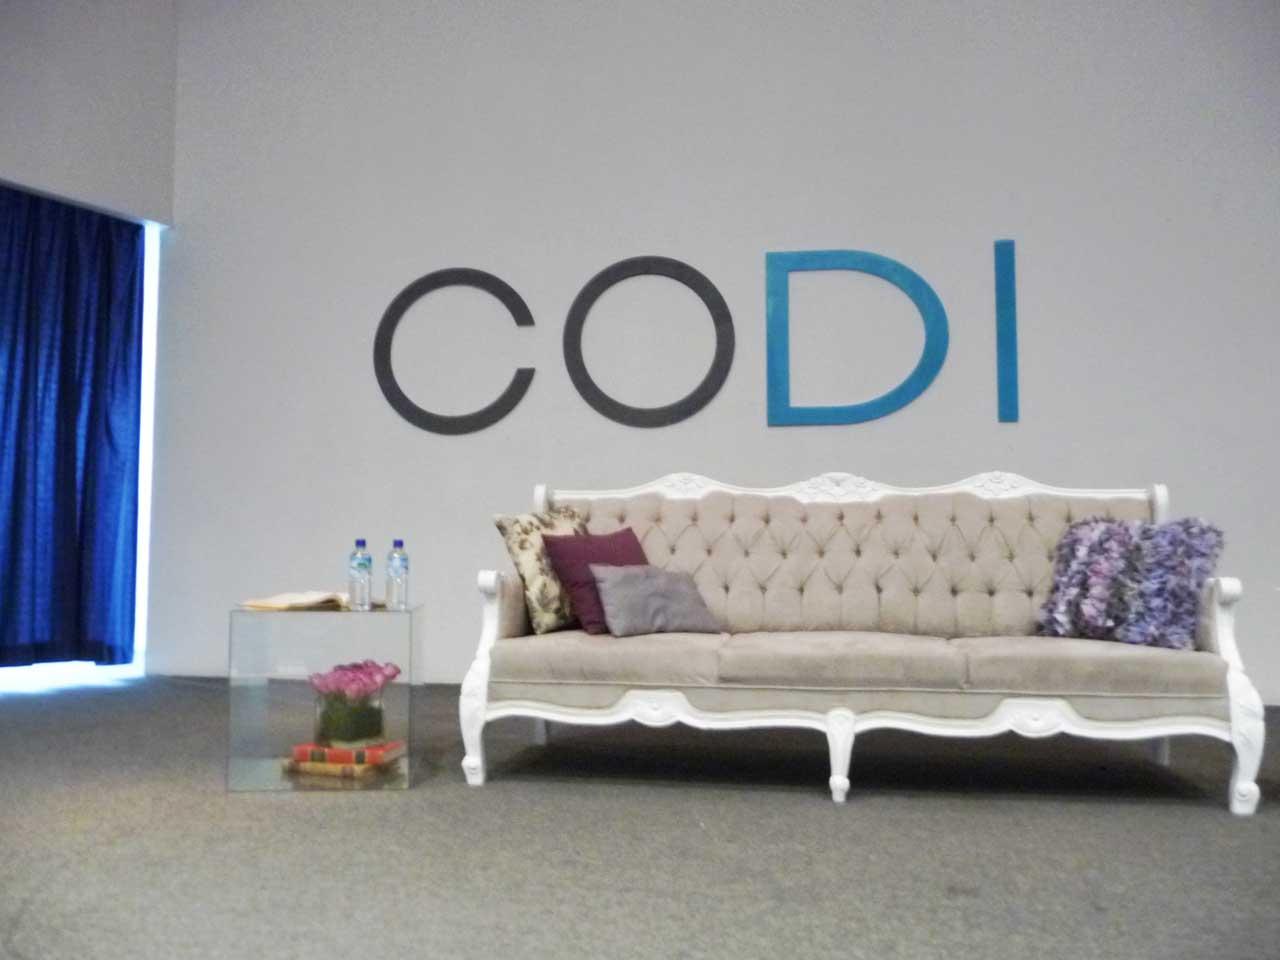 codi-01